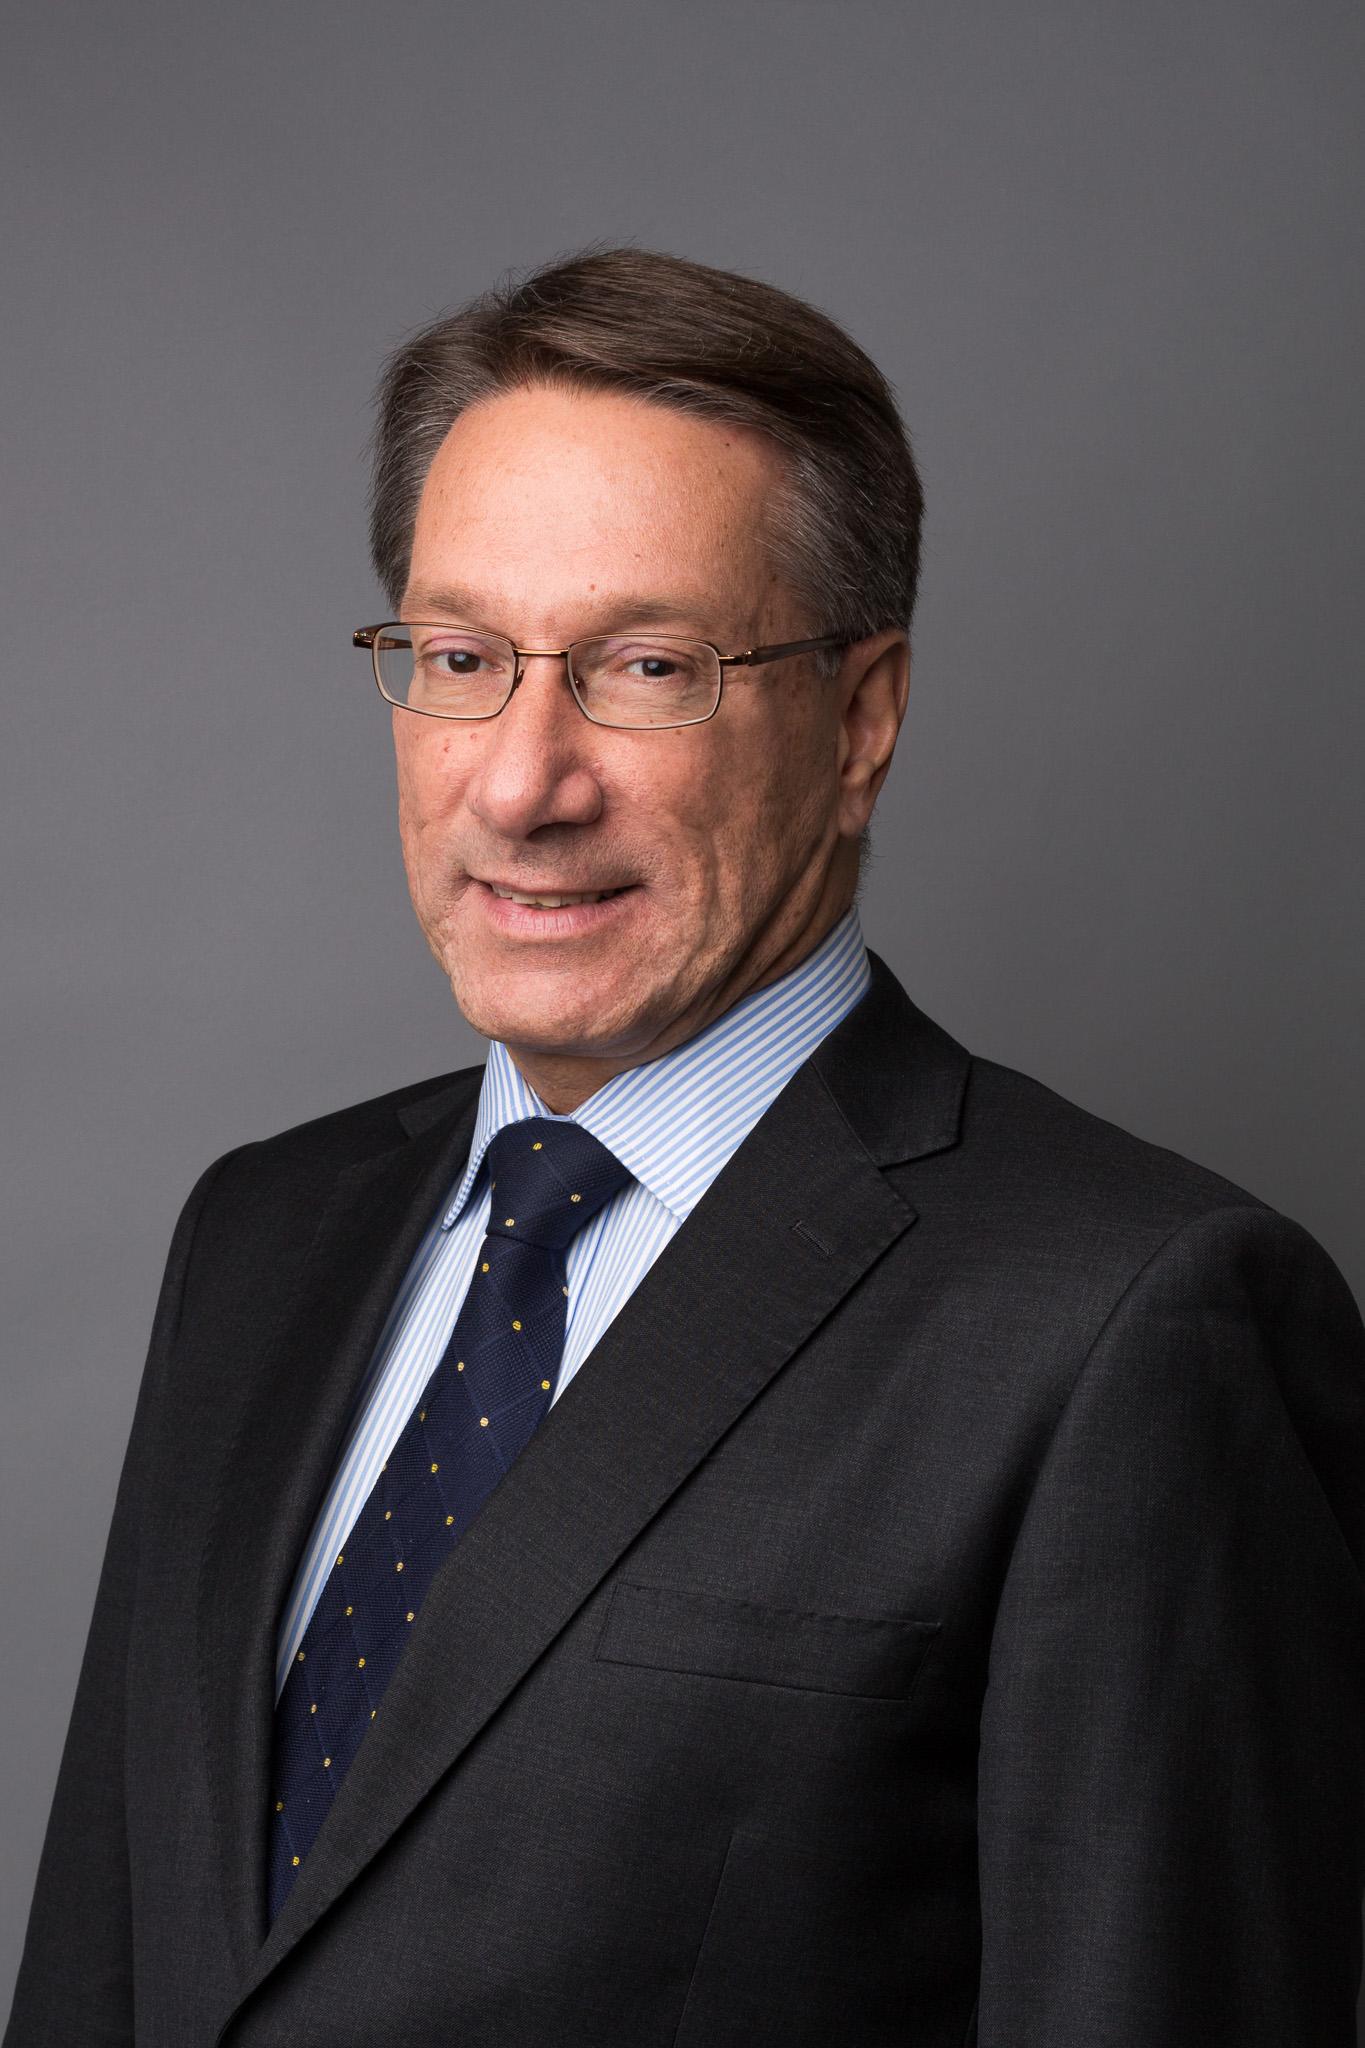 Stig Hedman